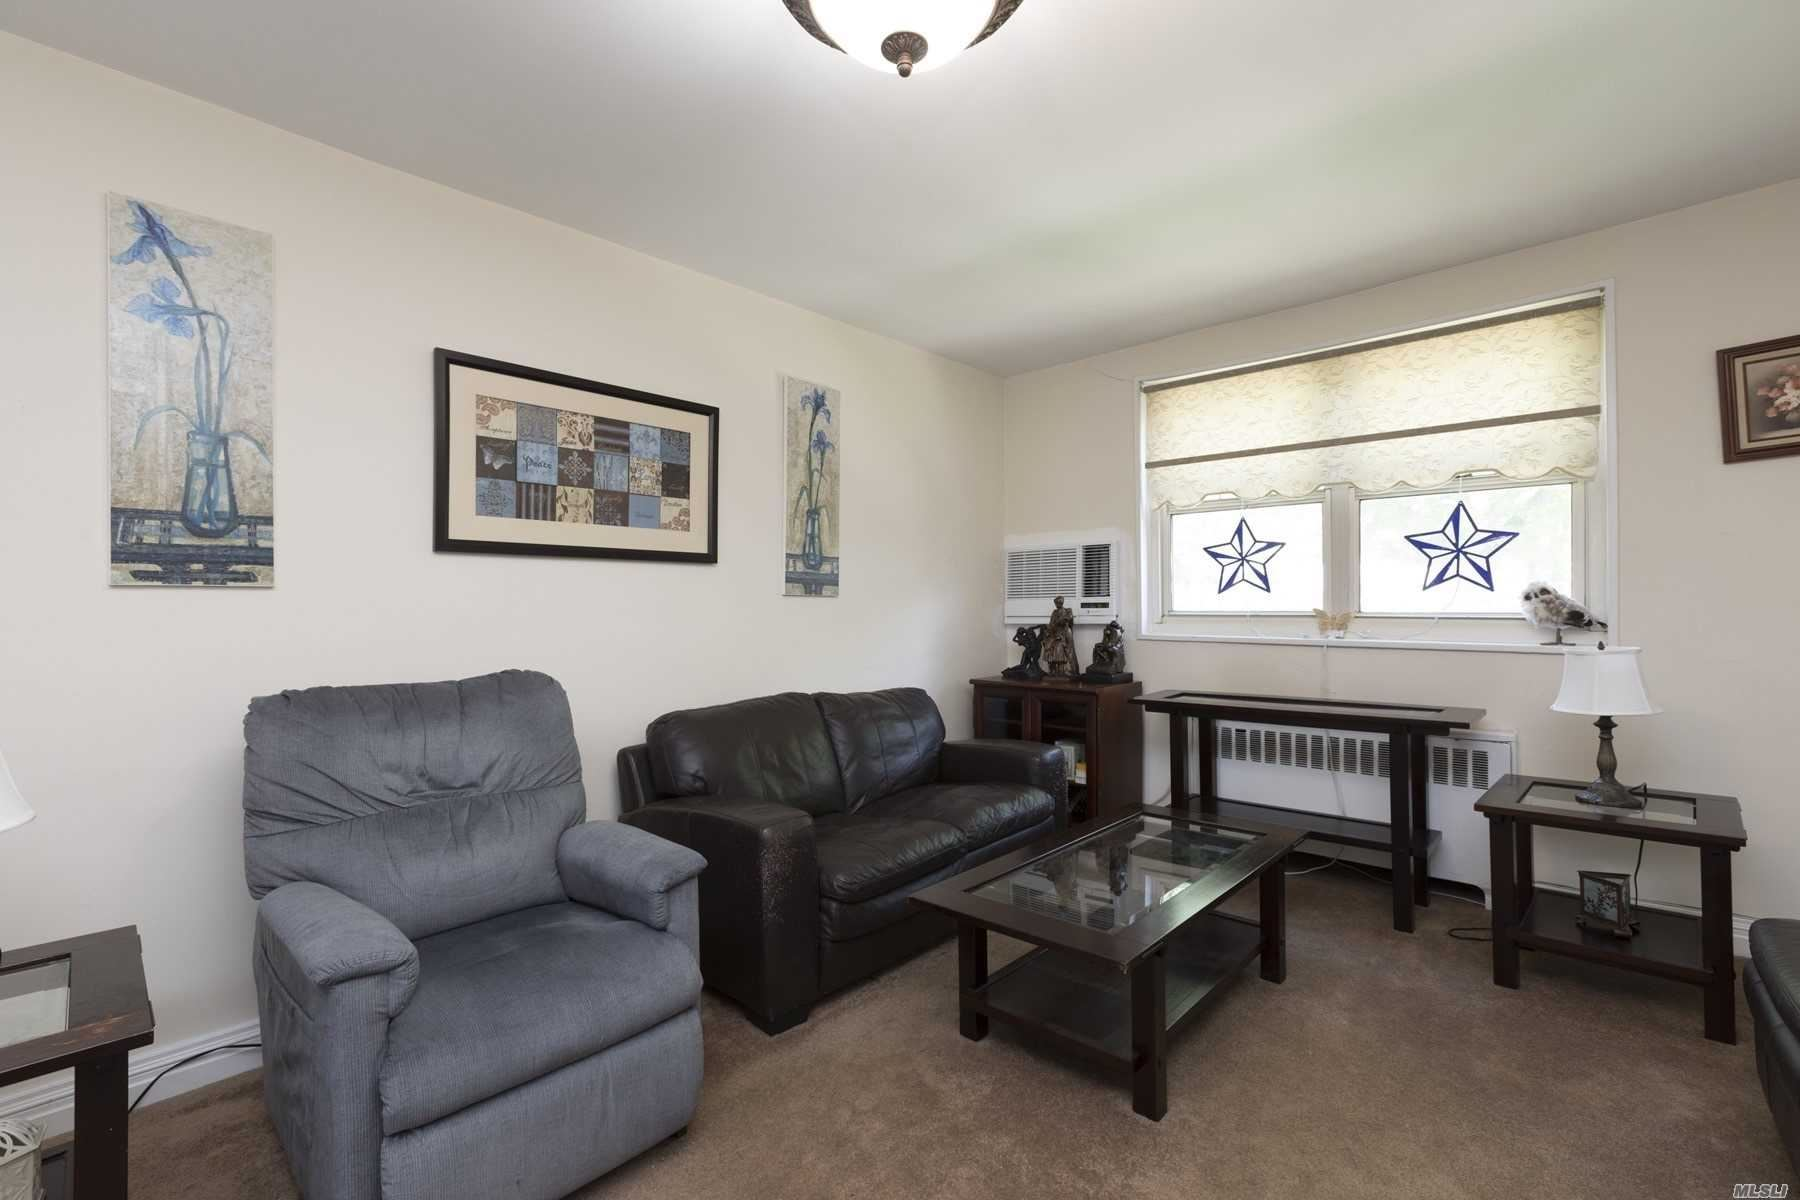 255-16 61st Avenue #Upper, Little Neck, NY 11362 - MLS#: 3228125